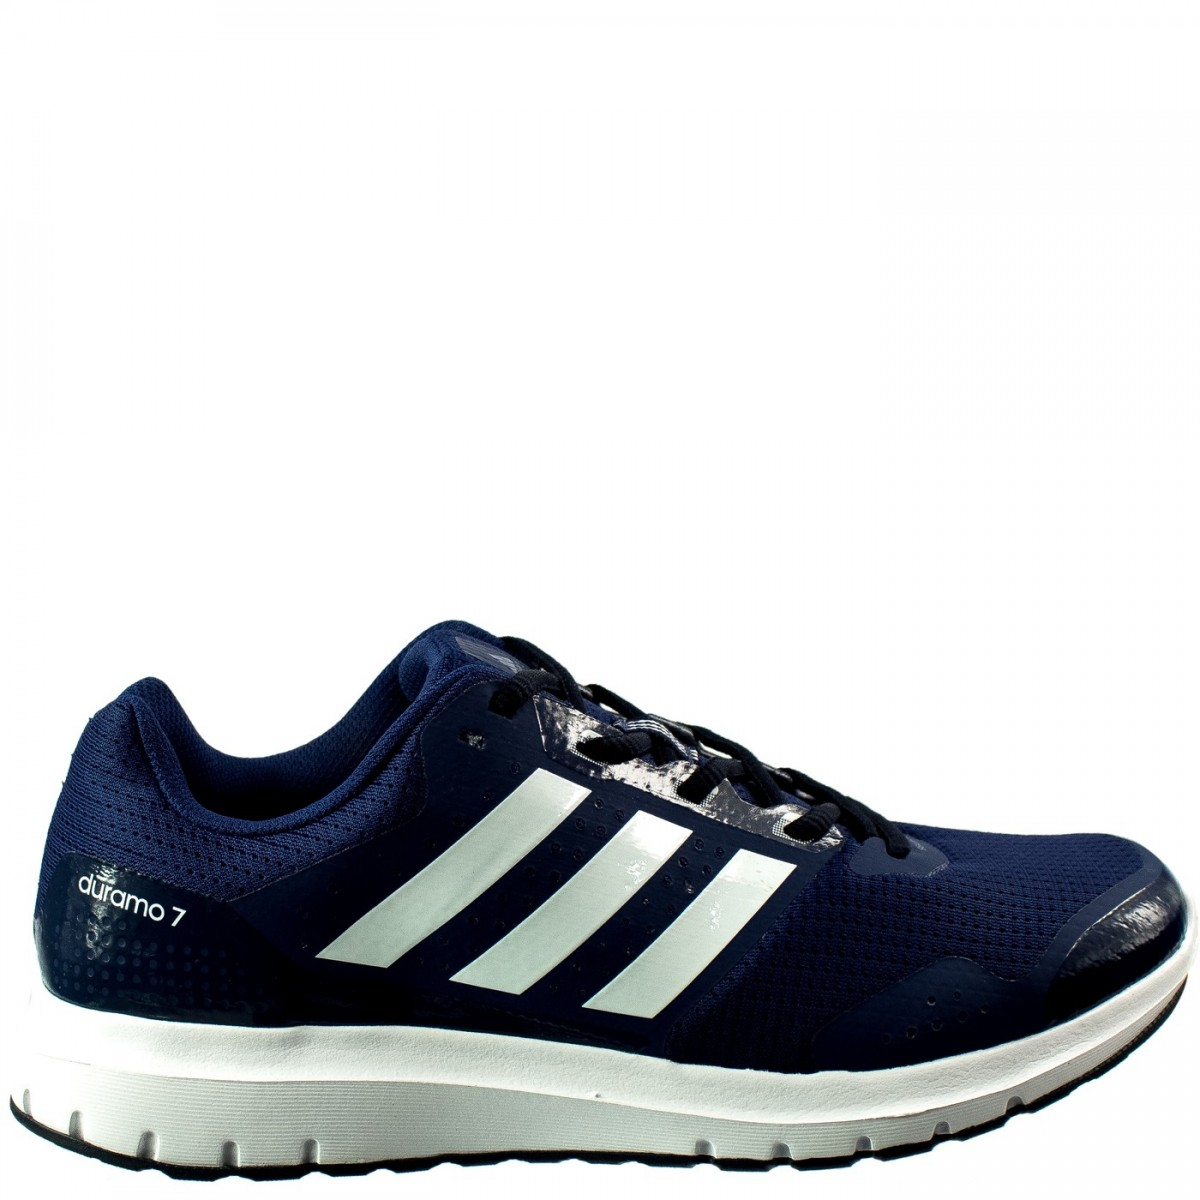 1a8618fca59 Bizz Store - Tênis Masculino Adidas Duramo 7 Corrida